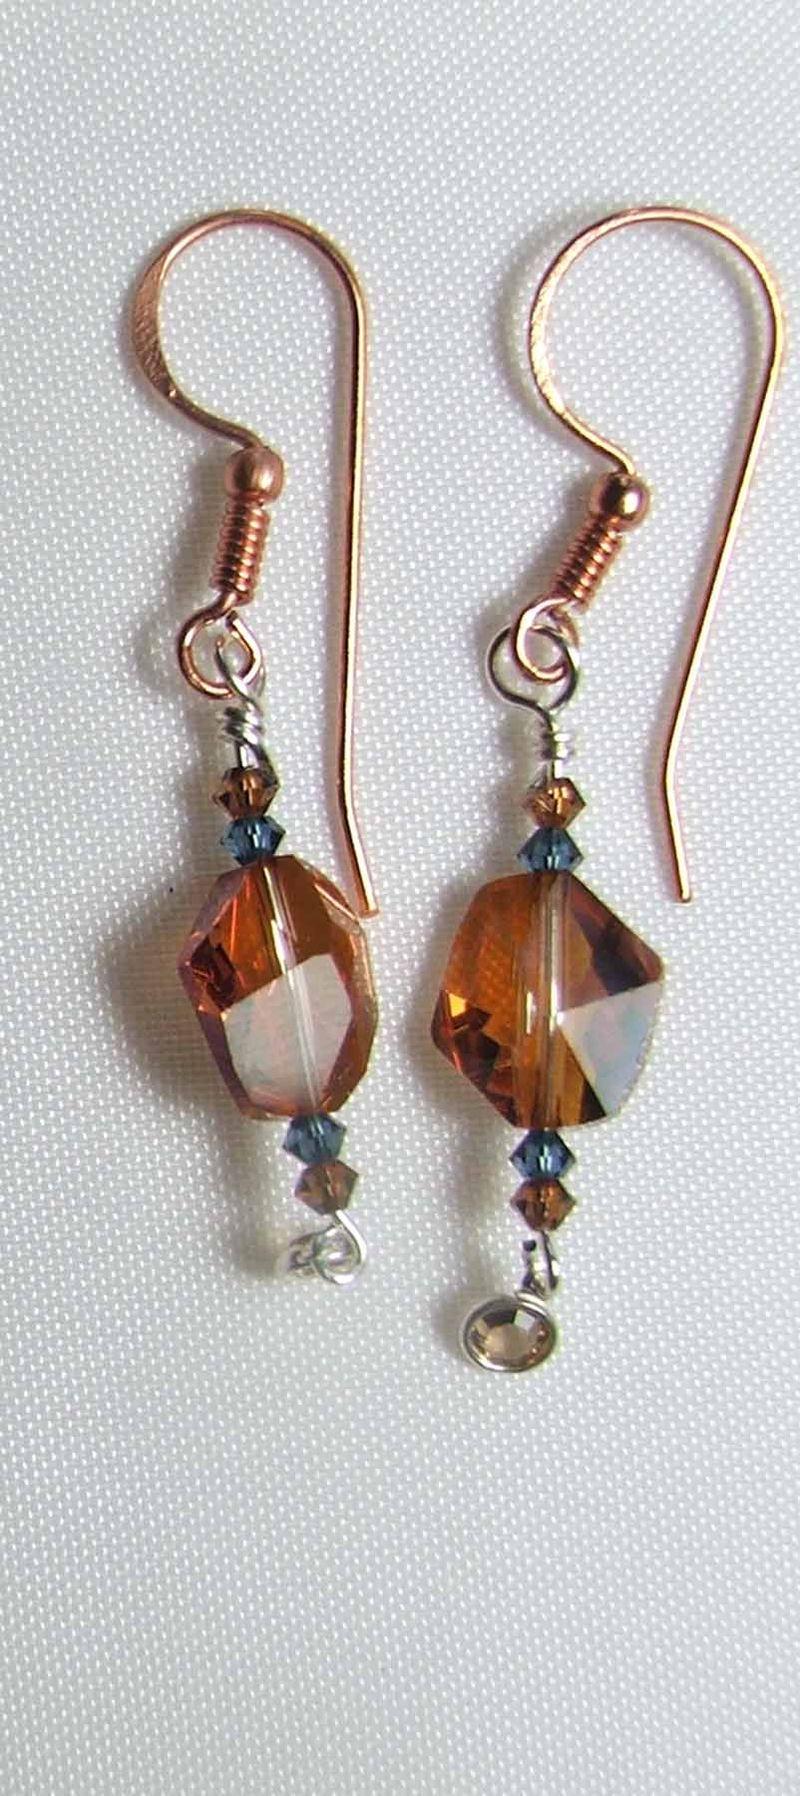 Artbeads.com earrings